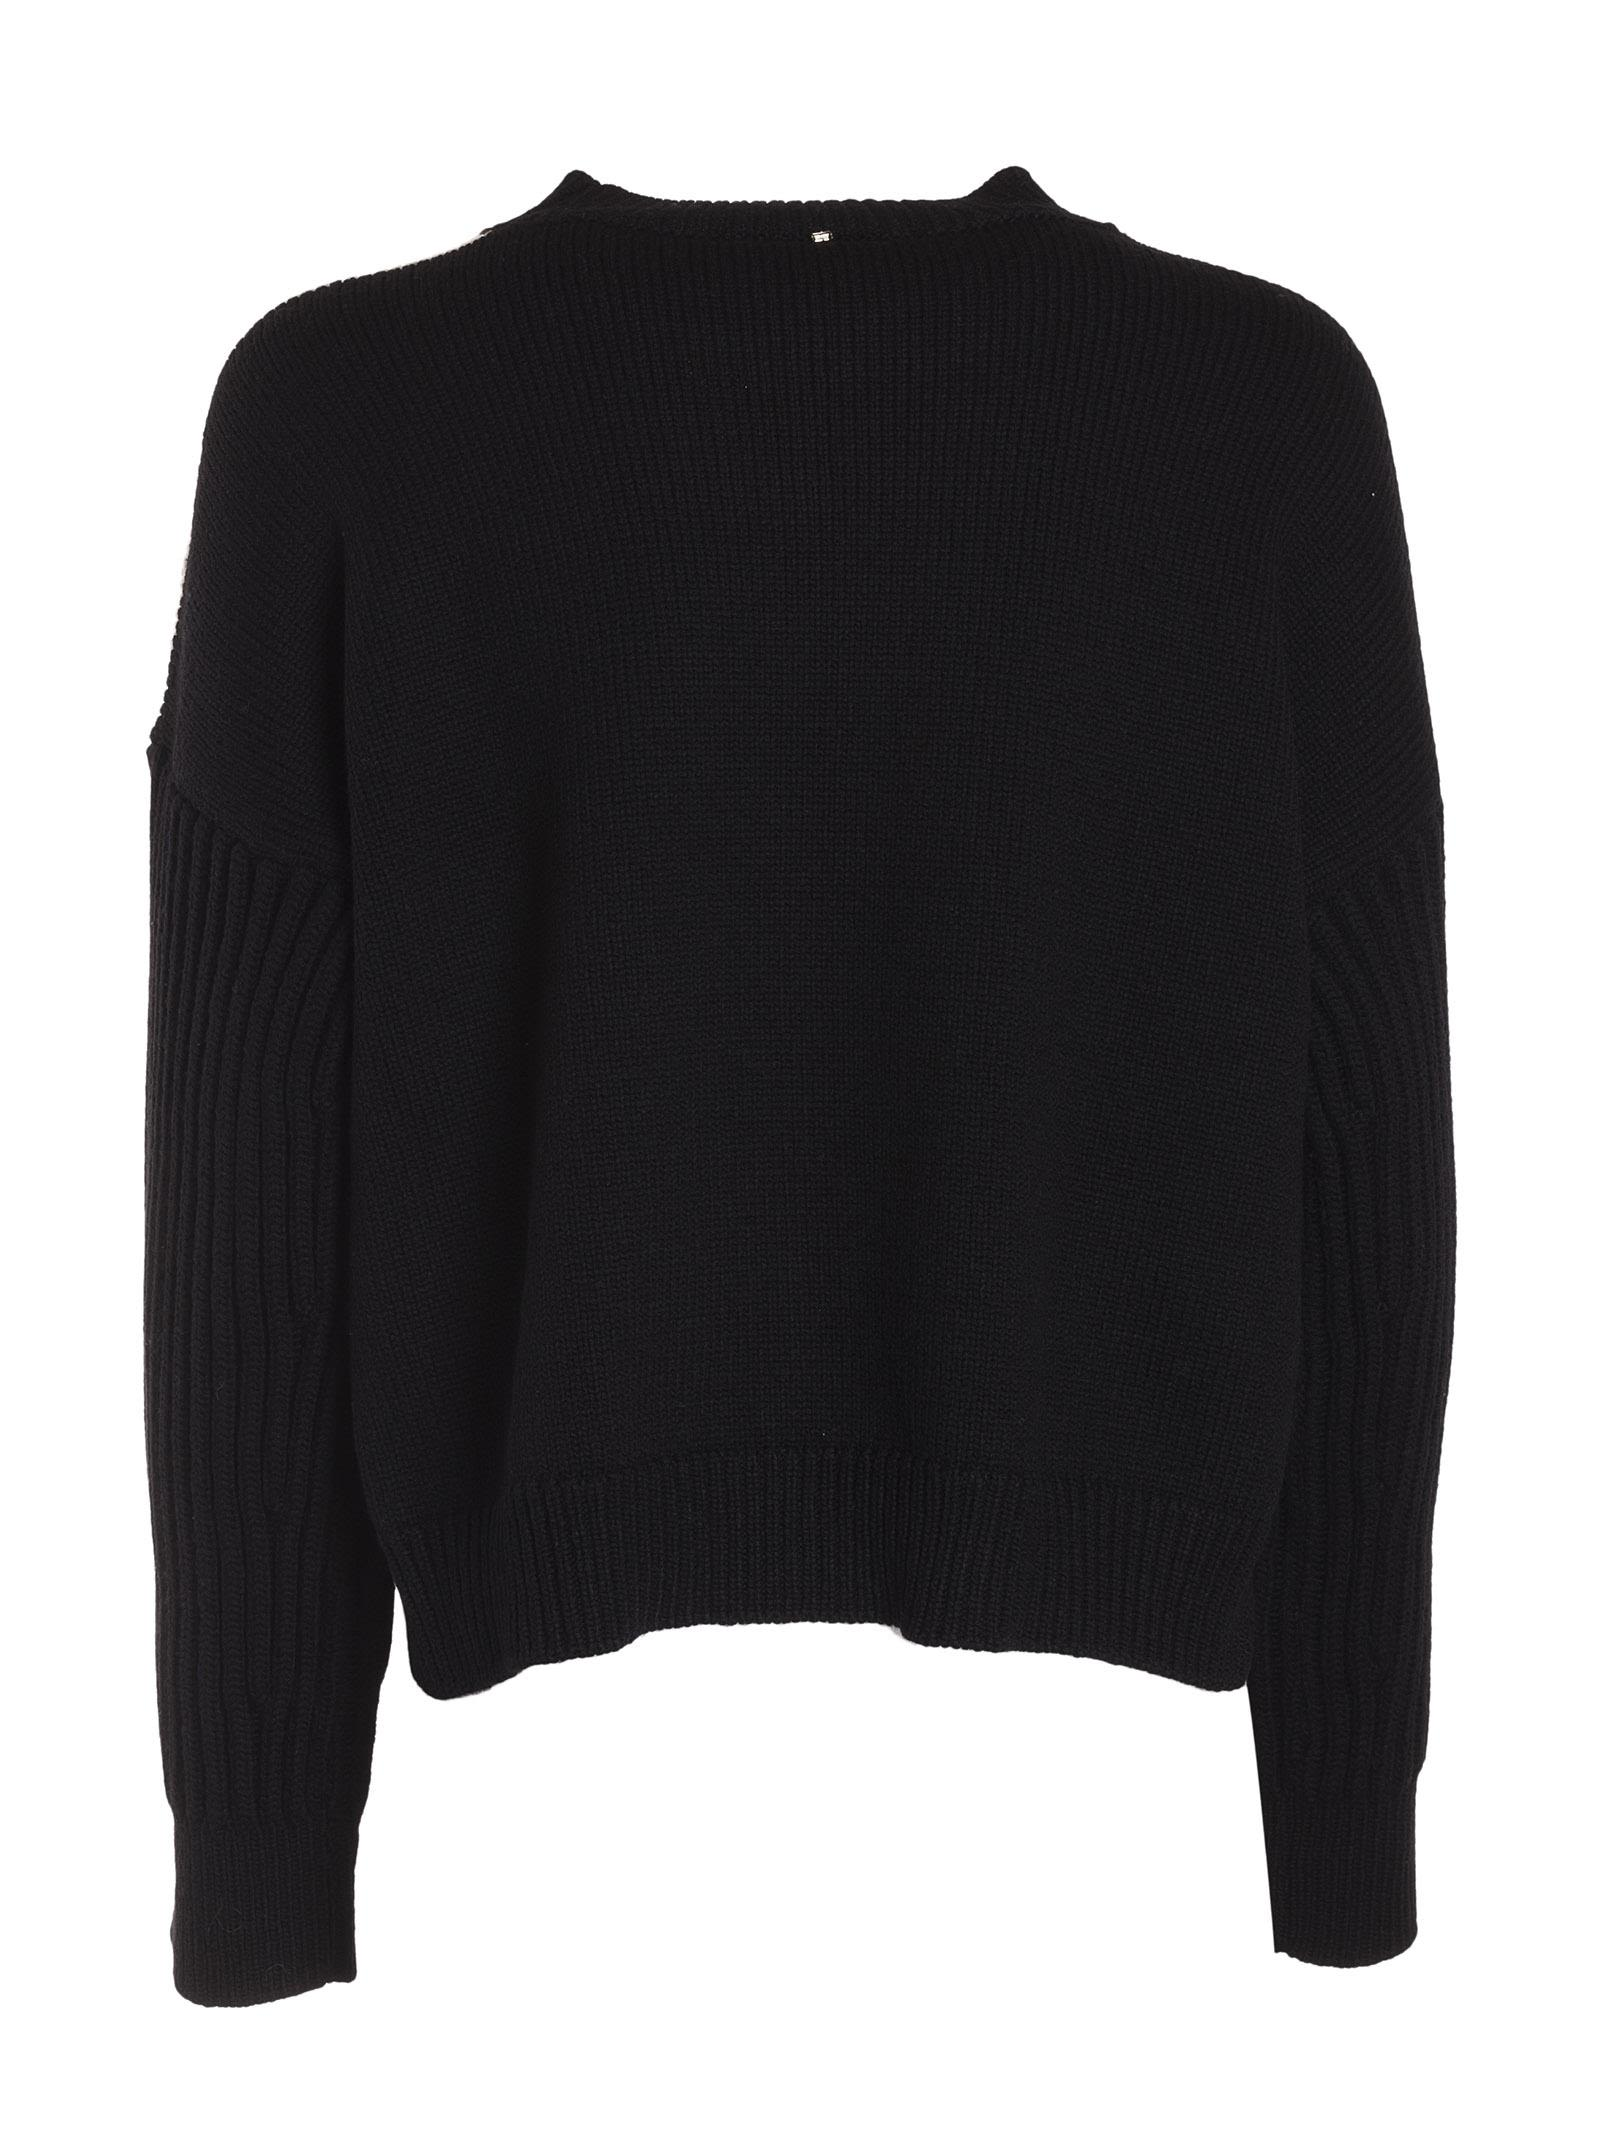 SportMax - Sportmax Knitted Sweater - Black/white, Women's ...